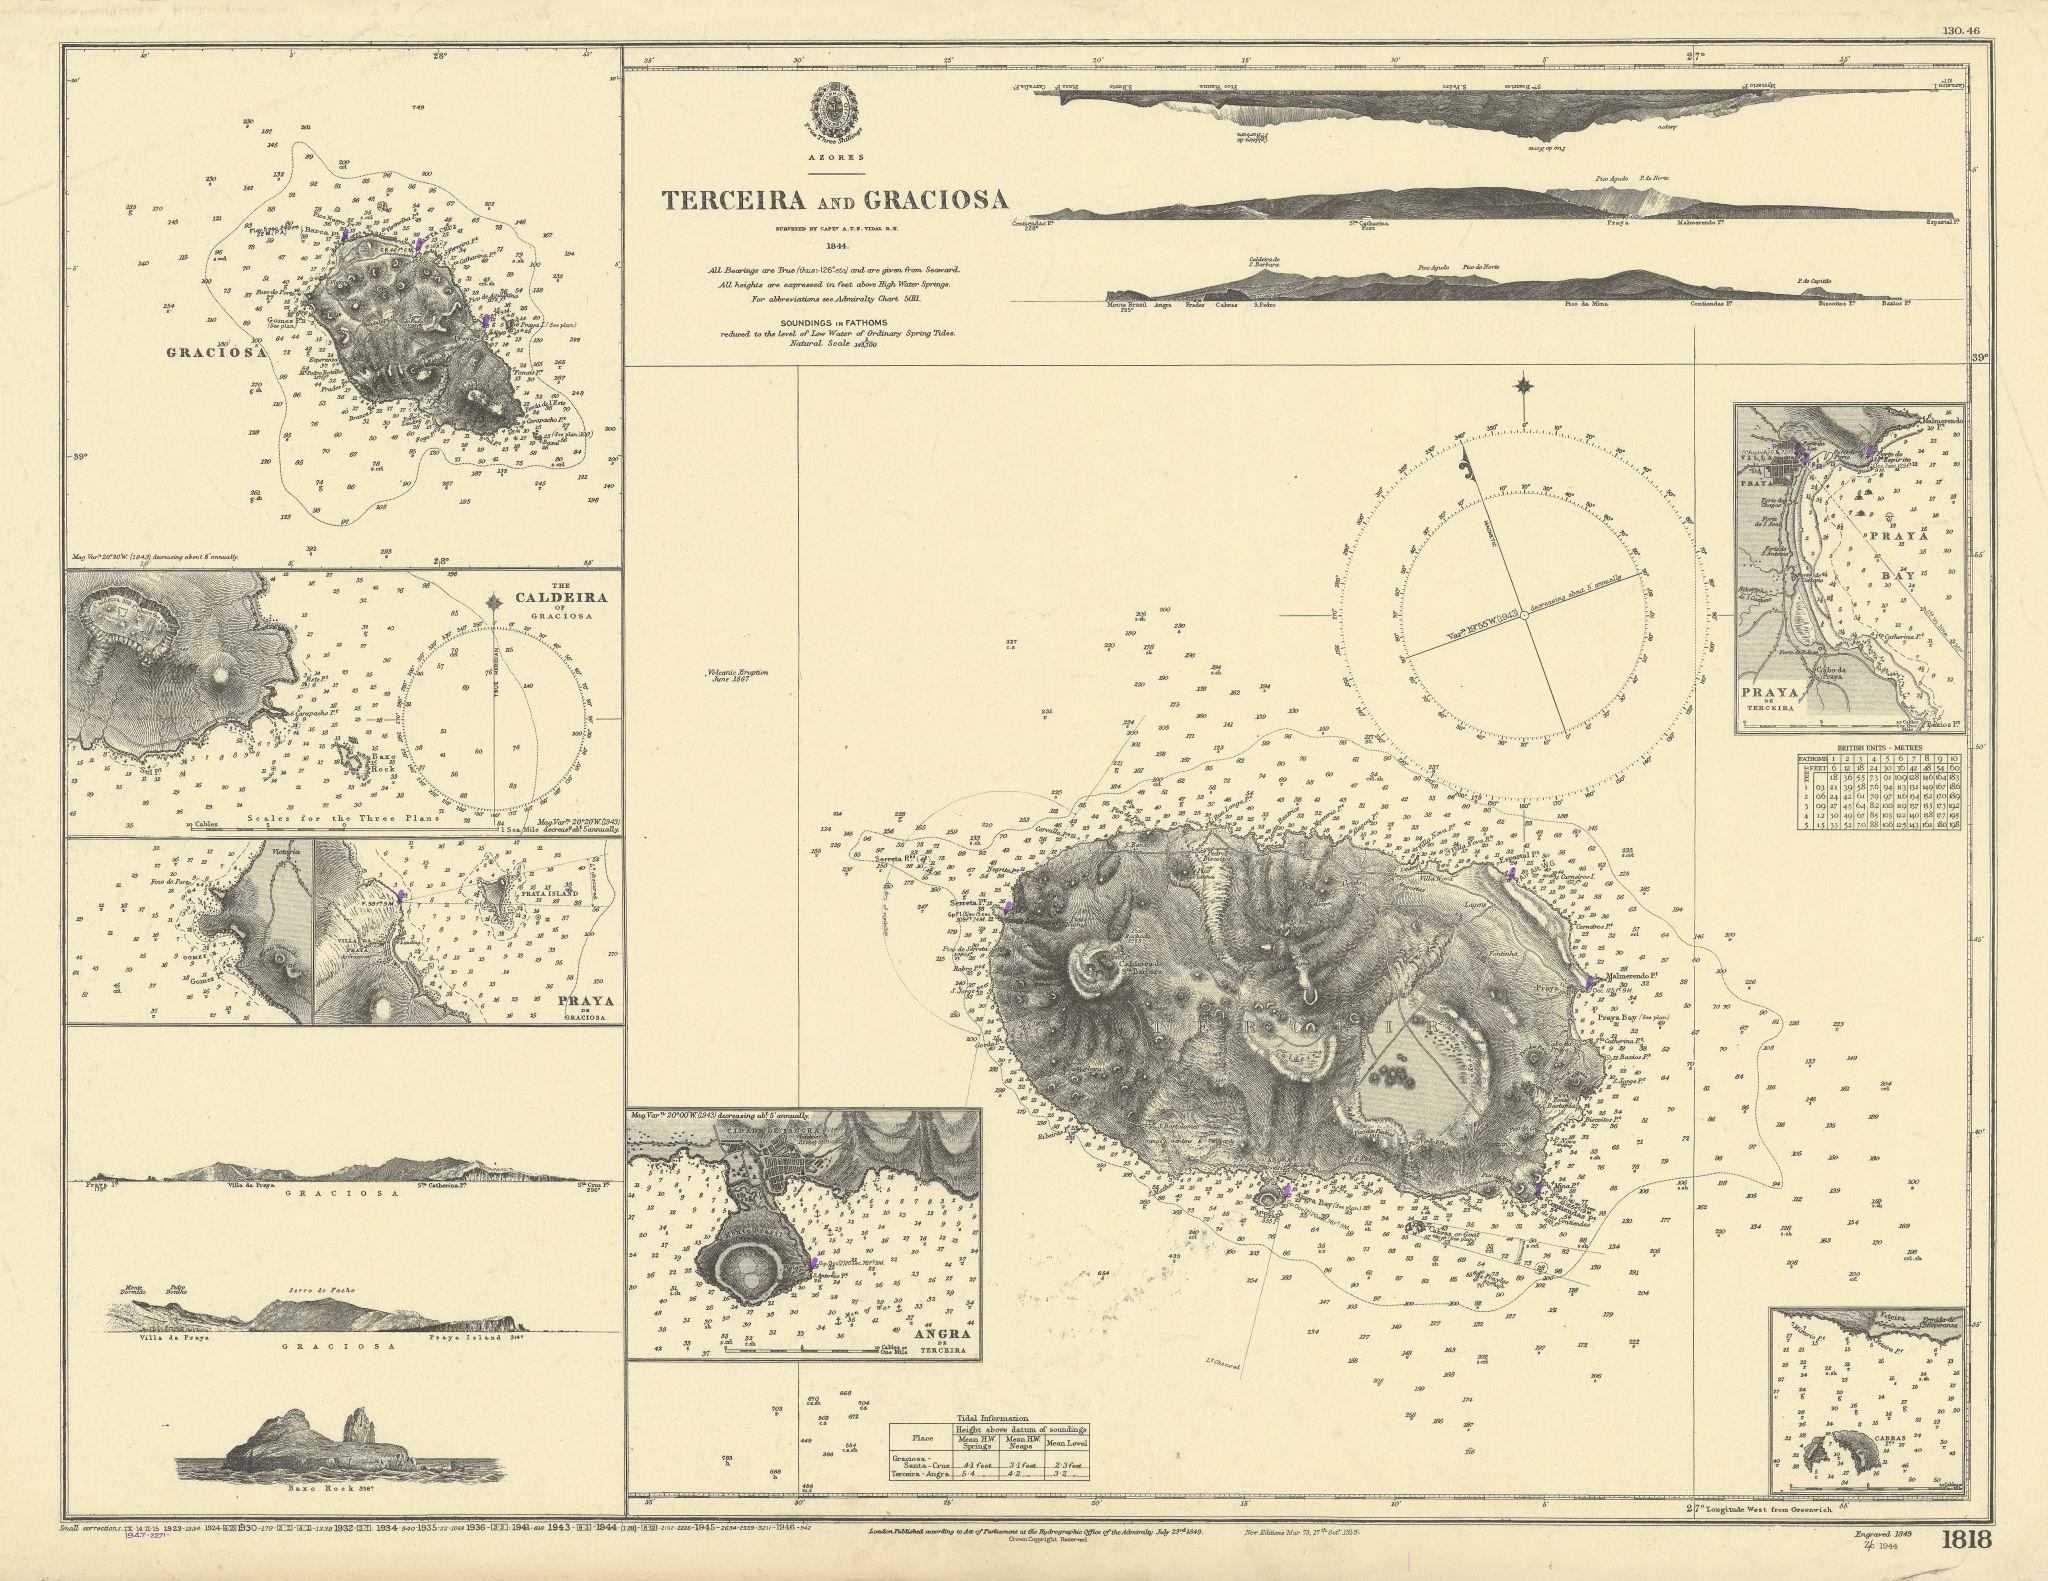 Azores. Terceira & Graciosa islands/harbours ADMIRALTY sea chart 1849 (1947) map